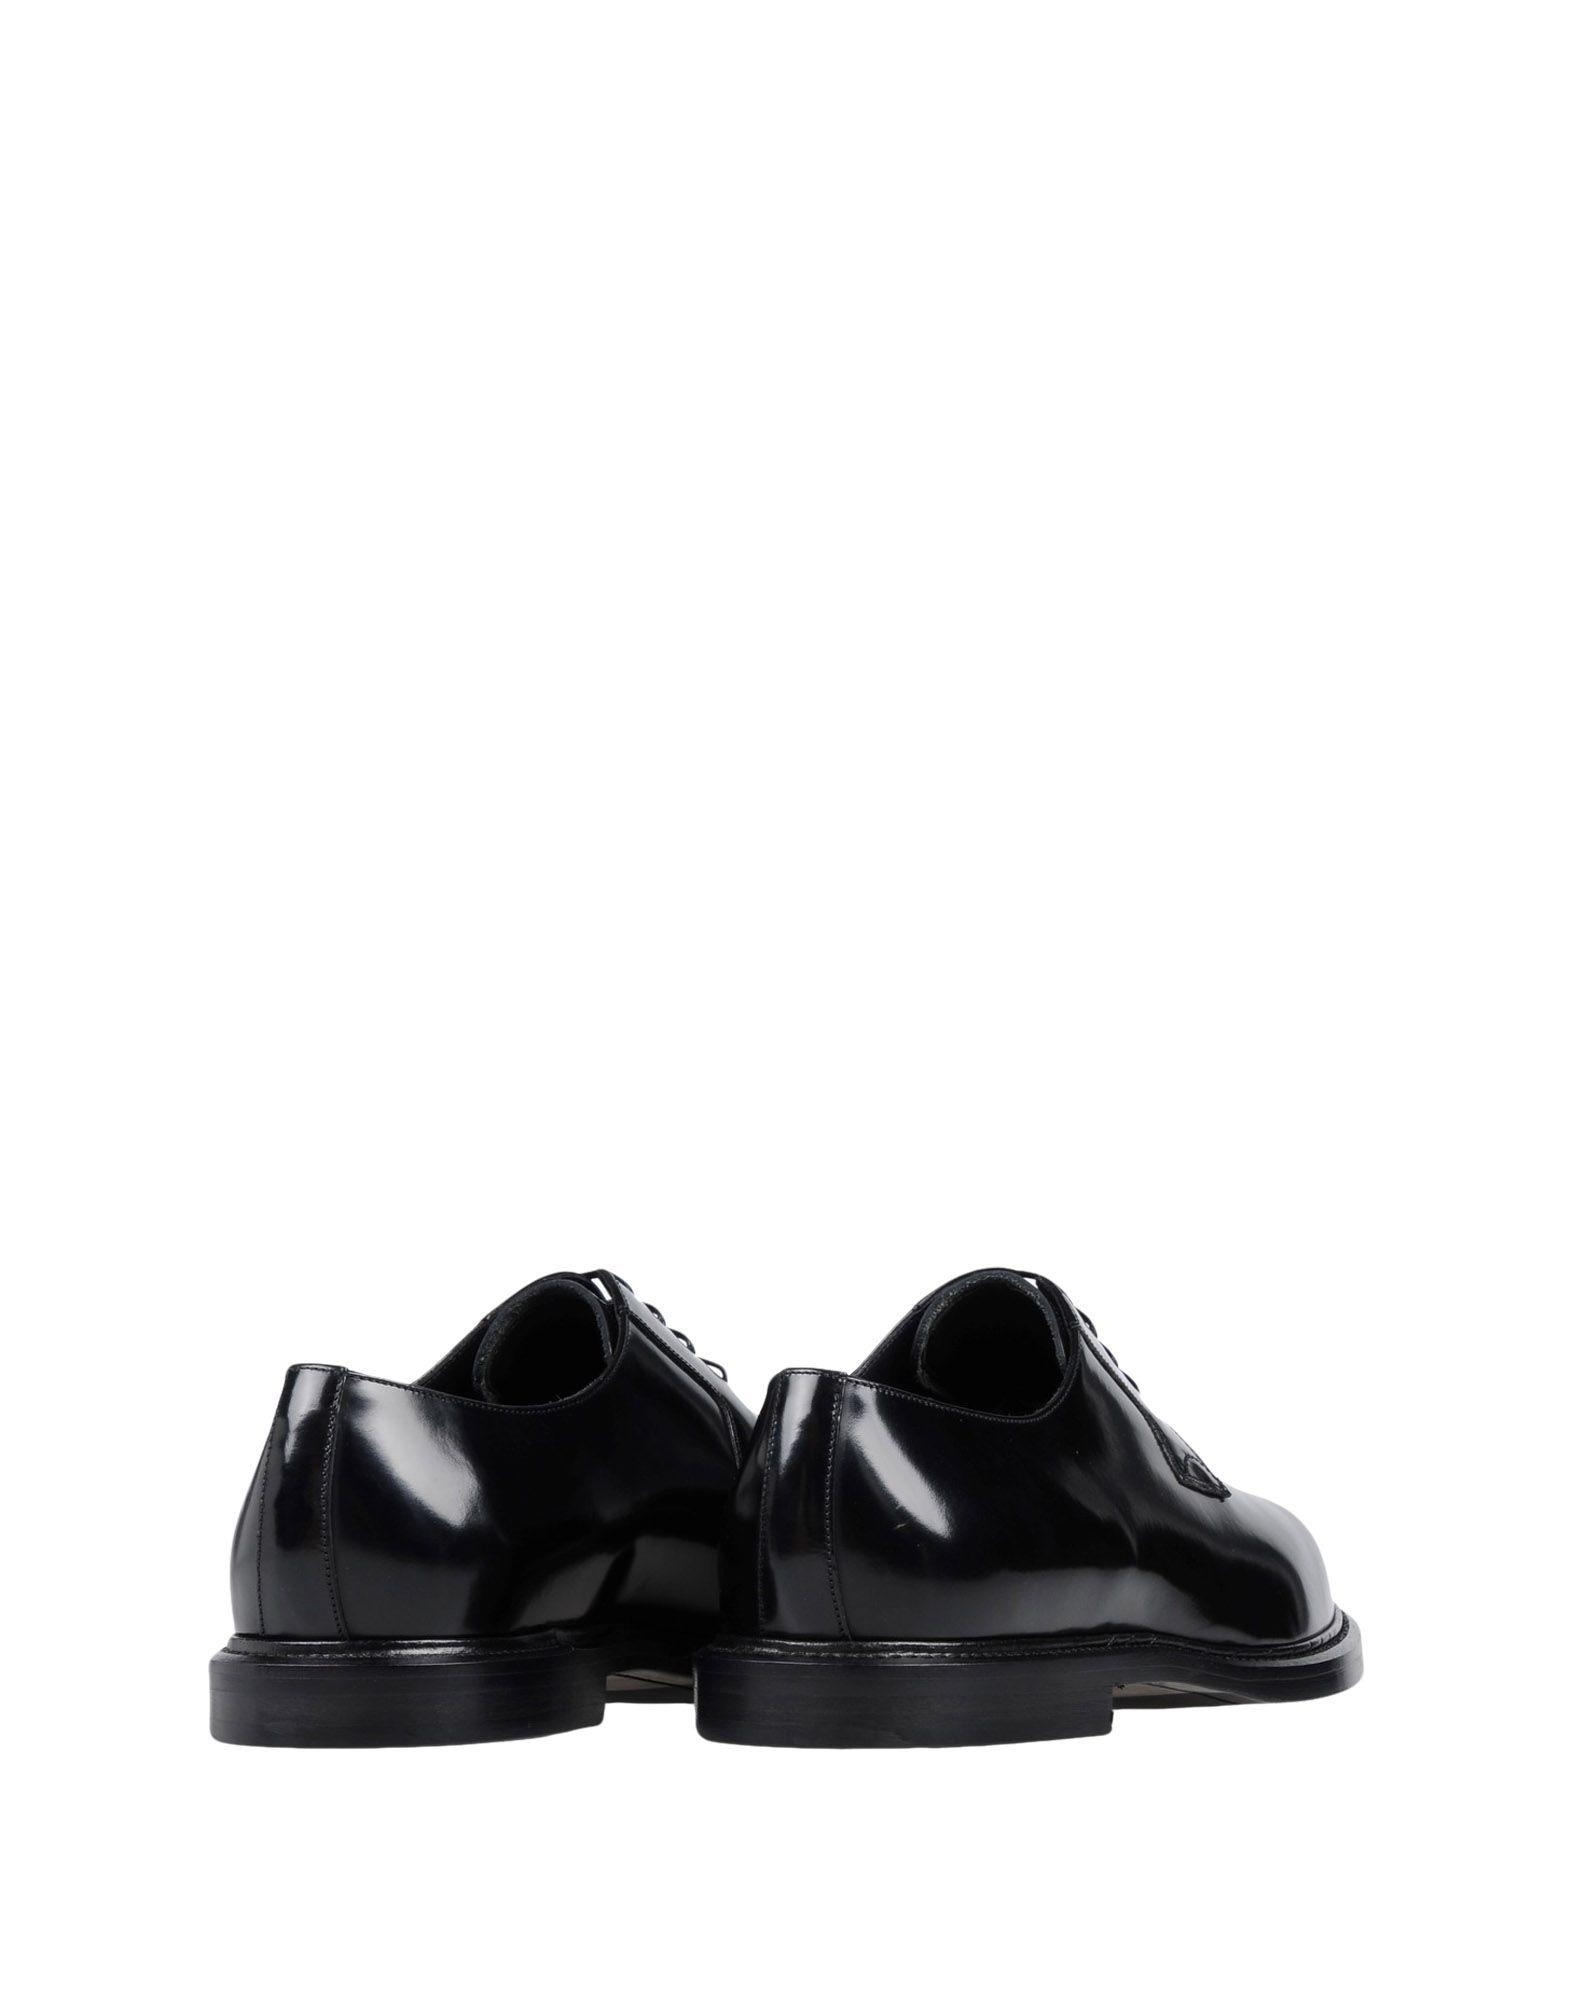 Dolce & Gabbana Black Polished Calf Leather Shoes